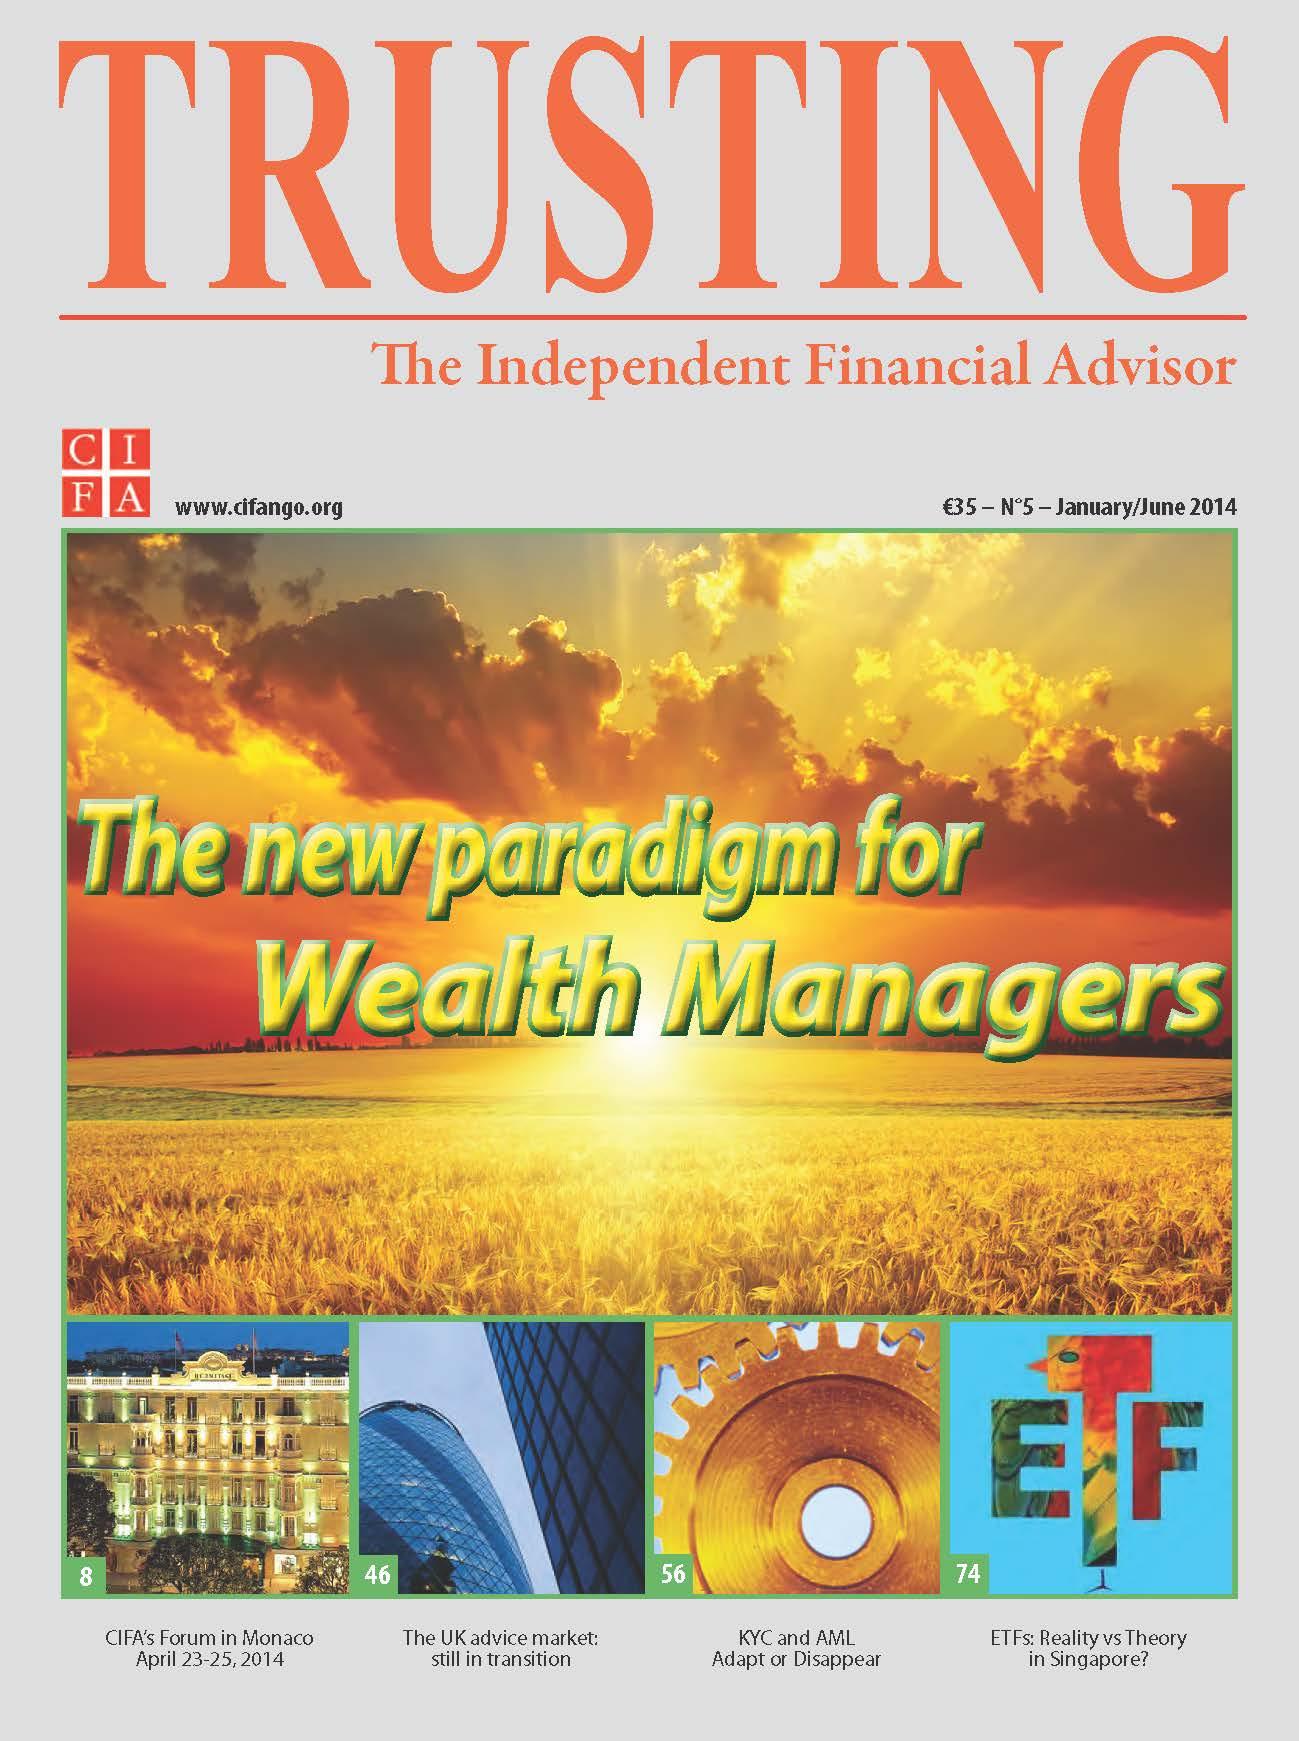 Trusting magazine No 5